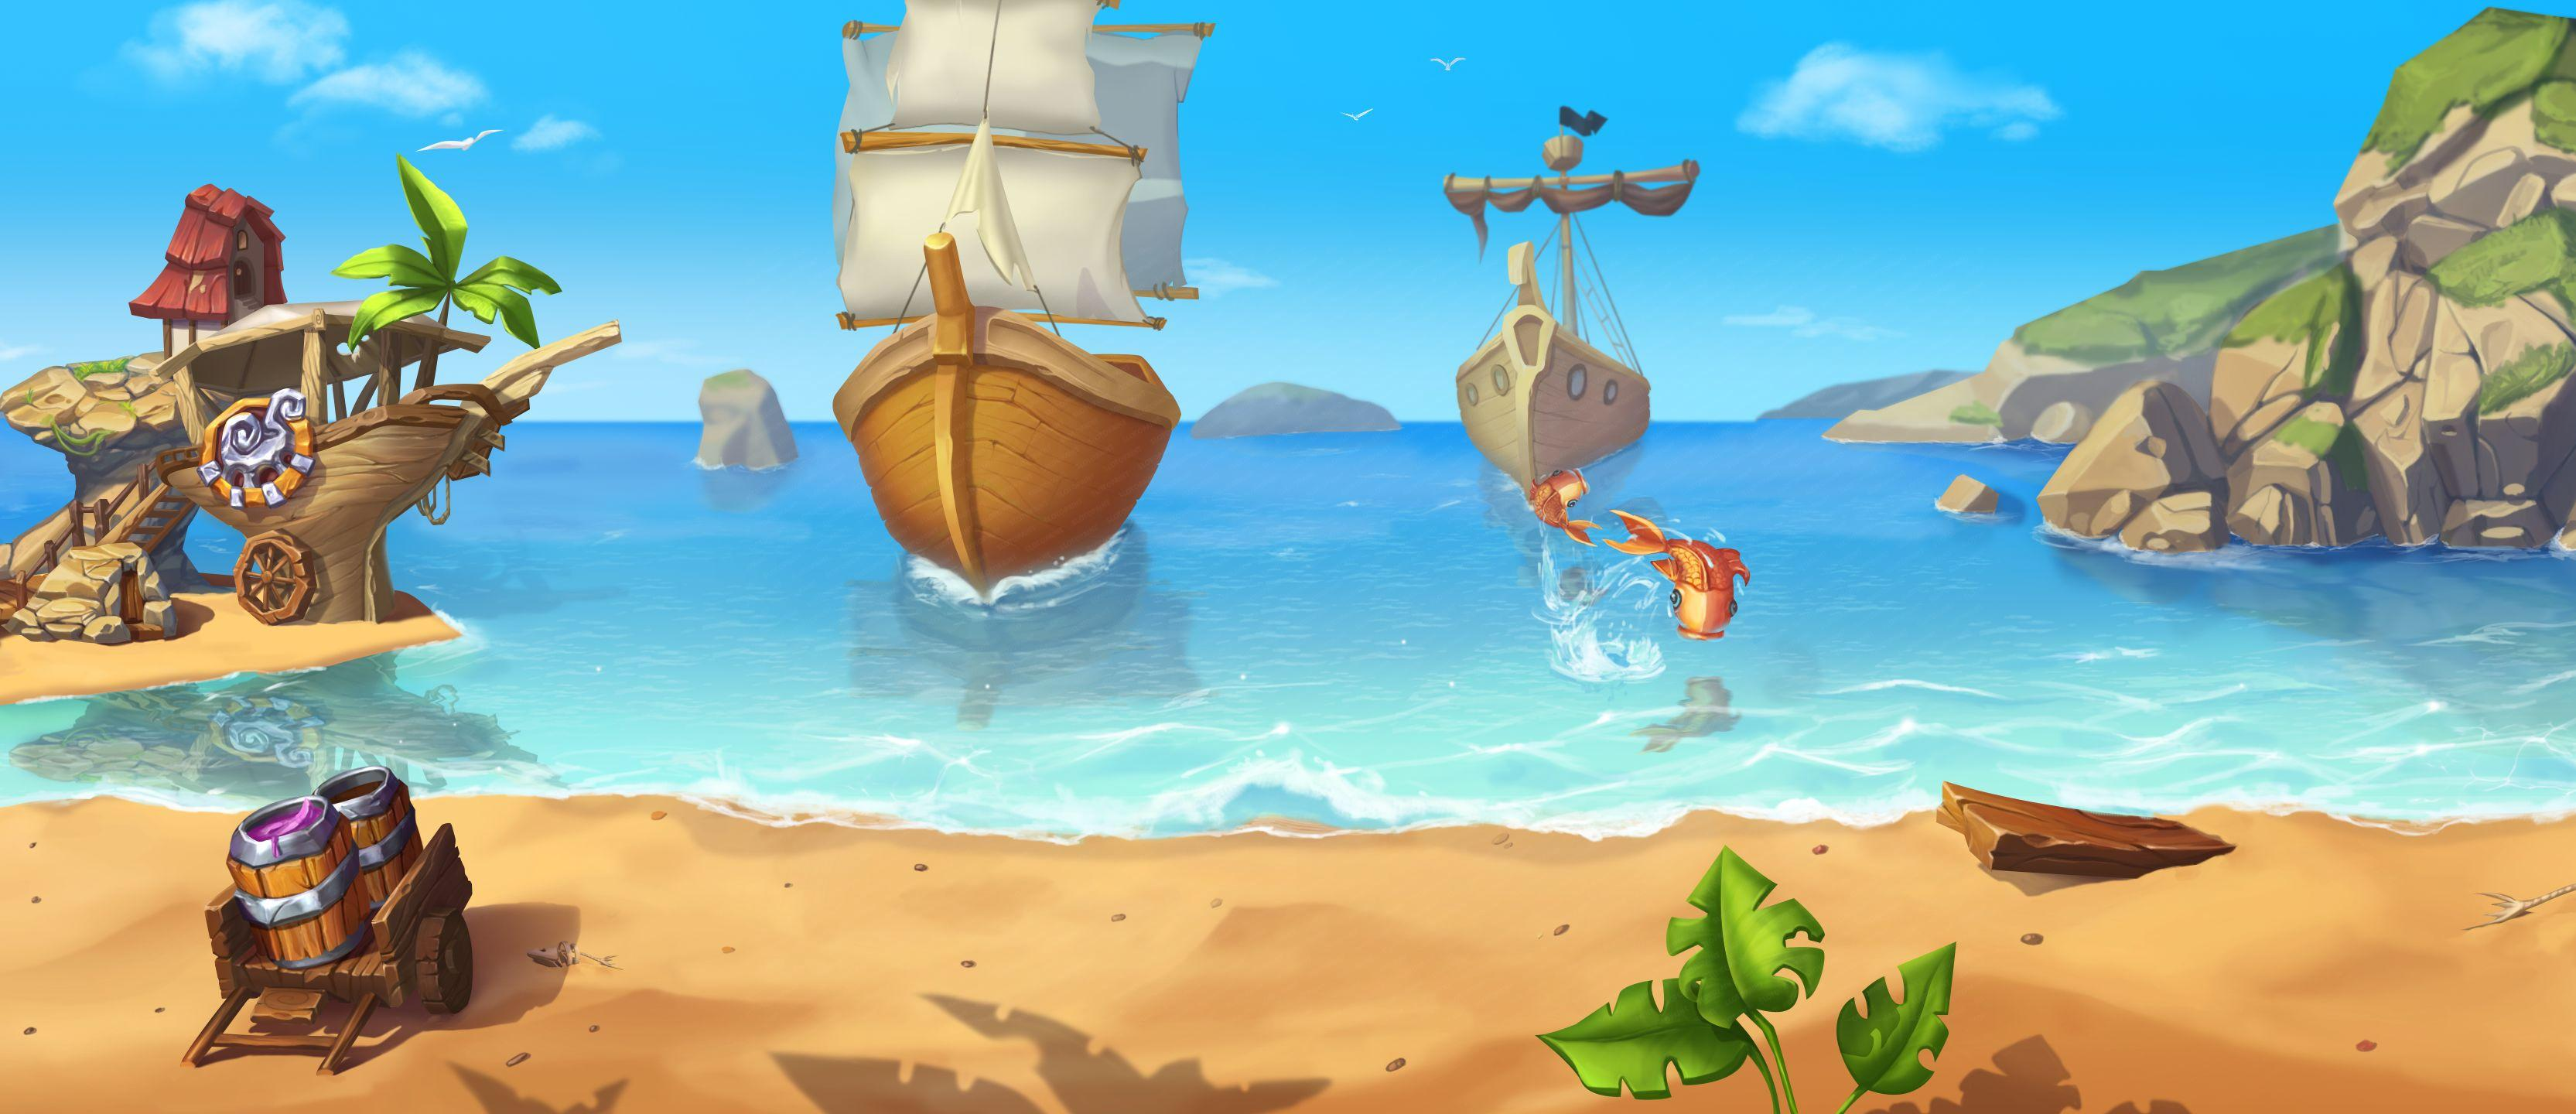 wildscreen_pirates2